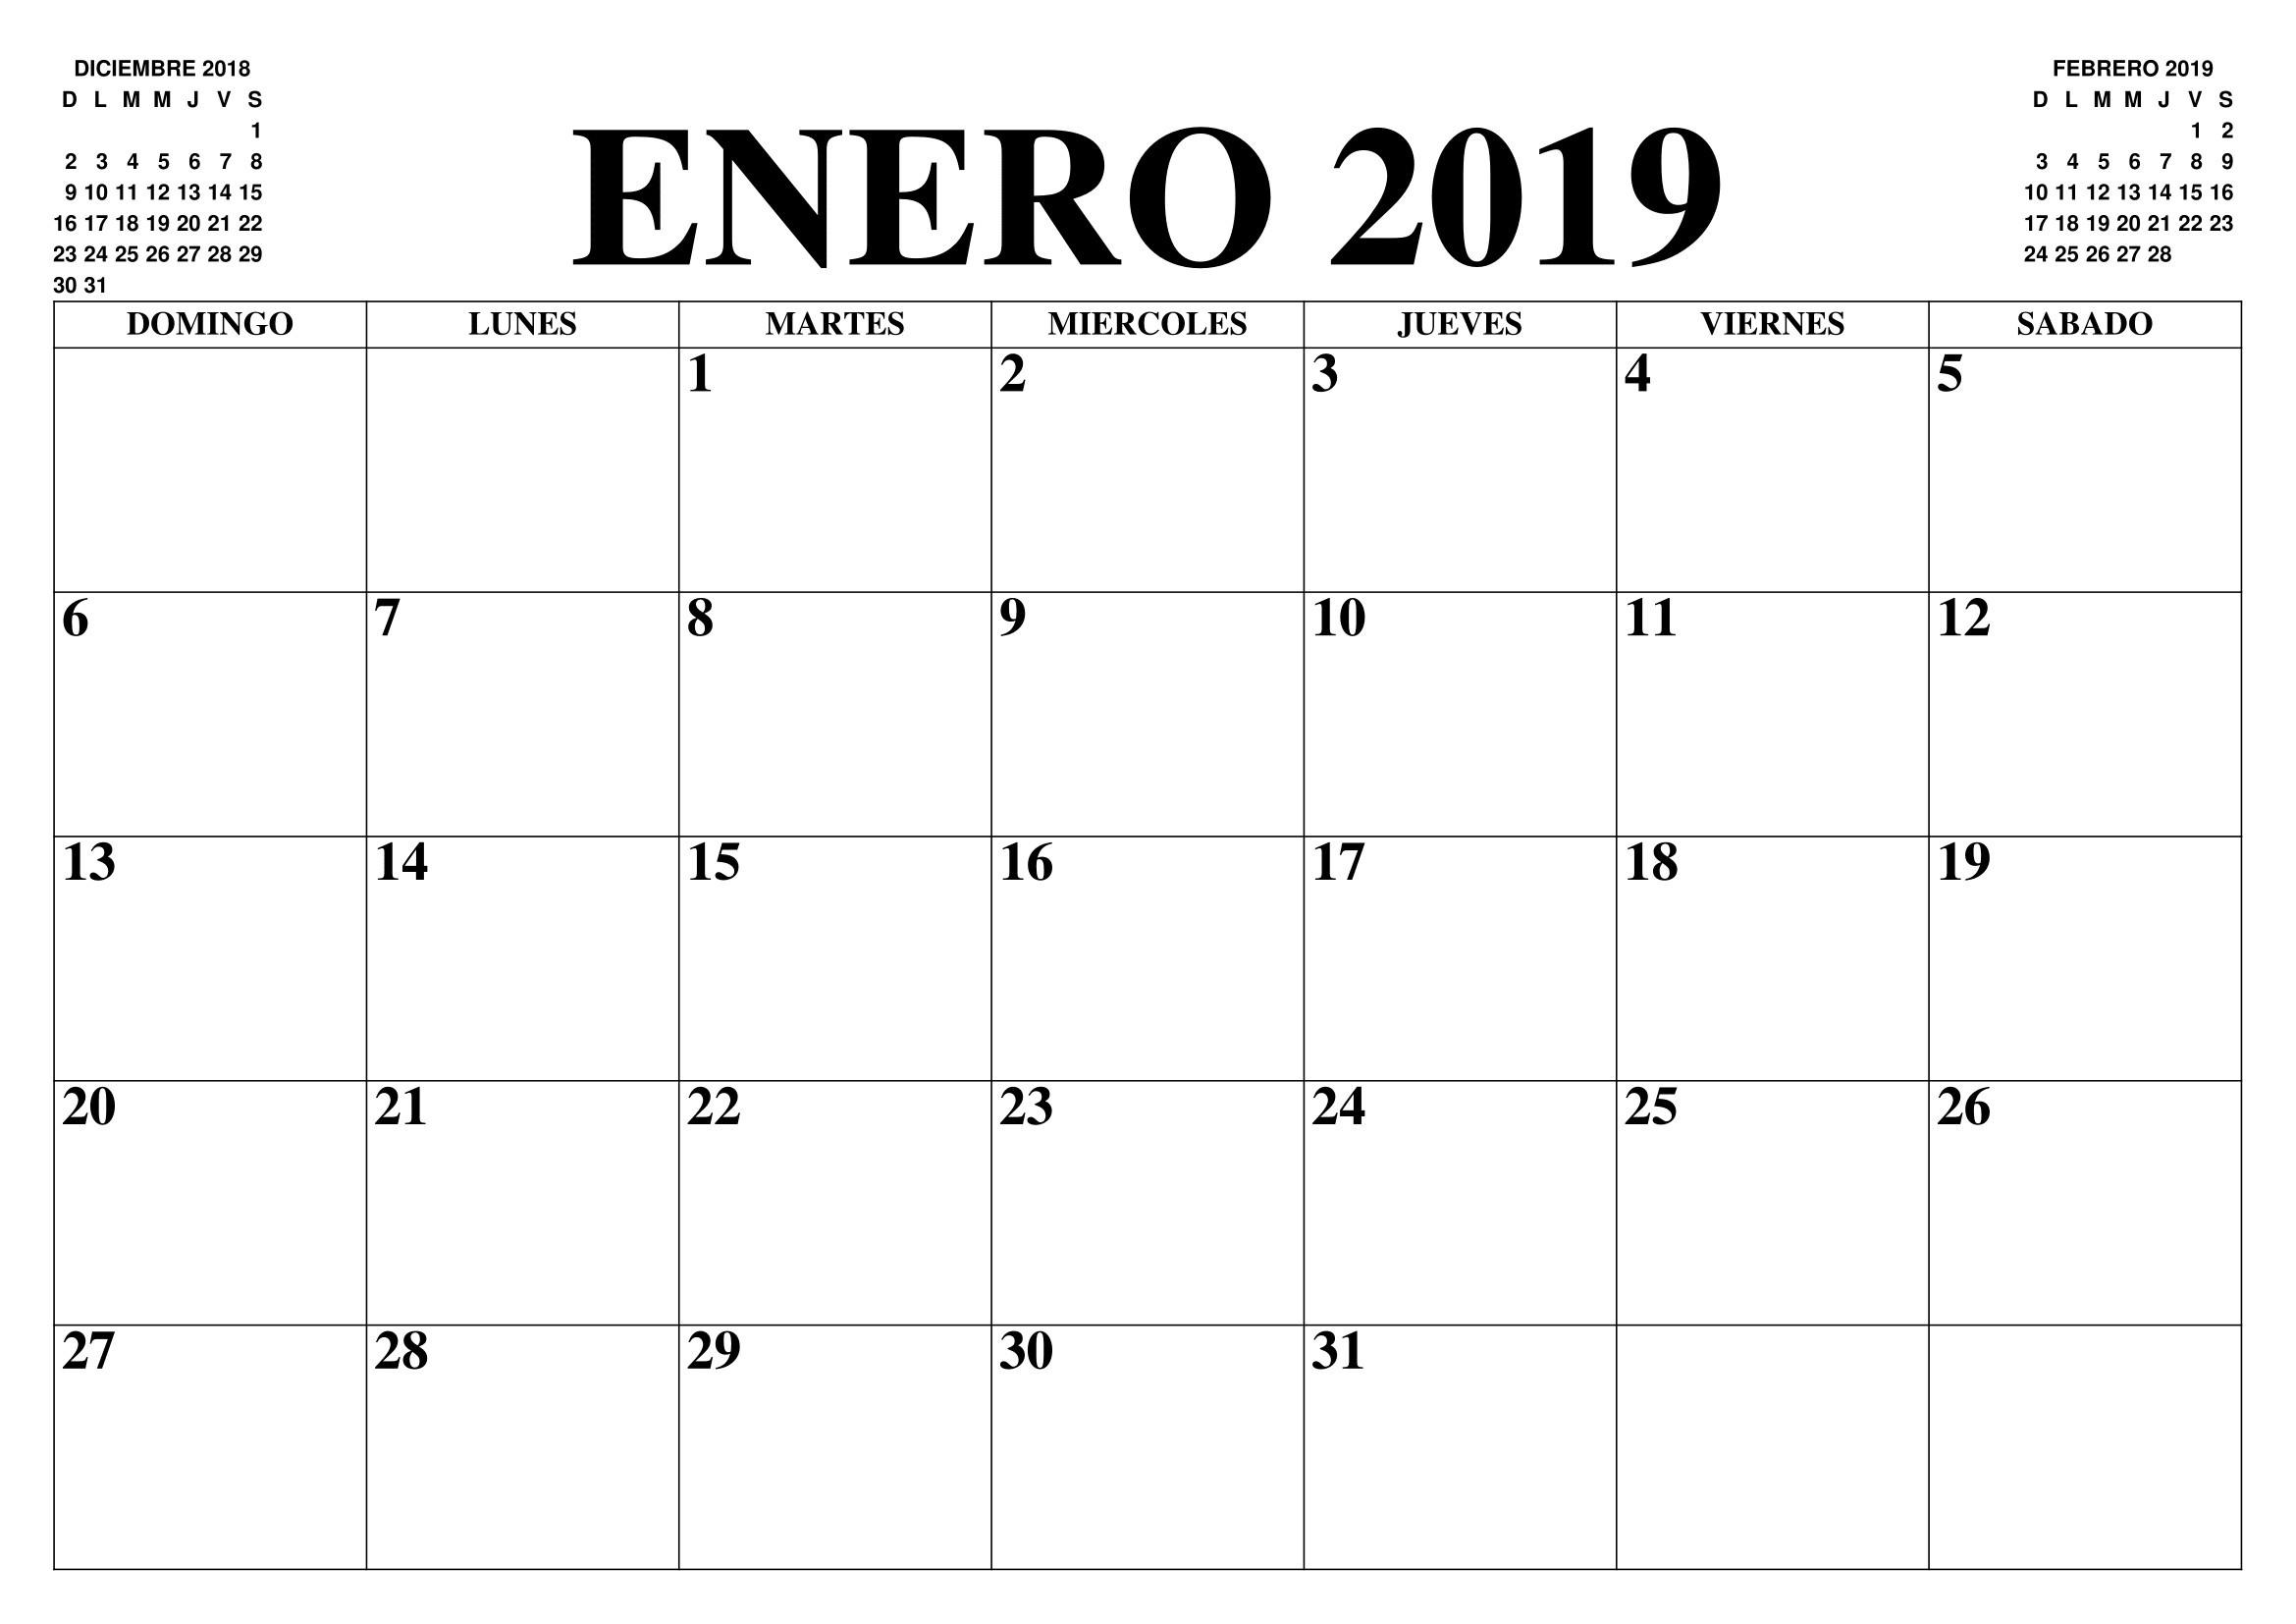 Calendario 2019 Argentina Para Imprimir Pdf Más Recientemente Liberado Calendario 2019 Para Imprimir Por Mes Of Calendario 2019 Argentina Para Imprimir Pdf Actual Calendario 2017